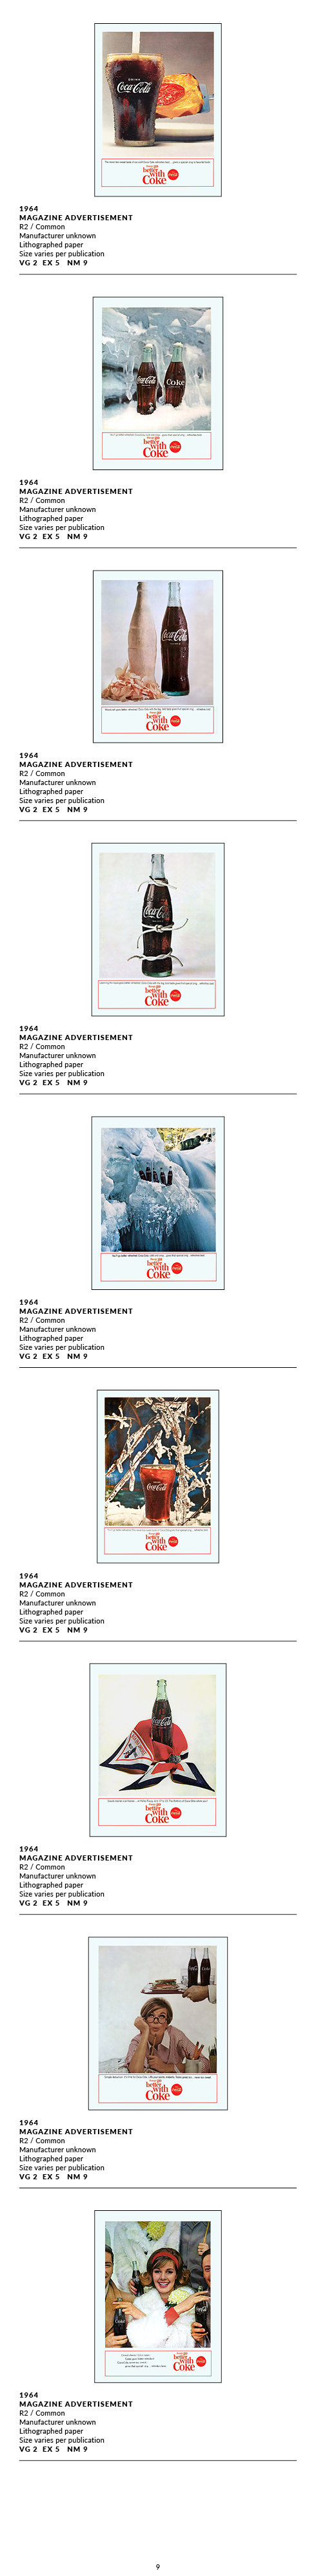 Desktop 1960-64 Ads Master9.jpg